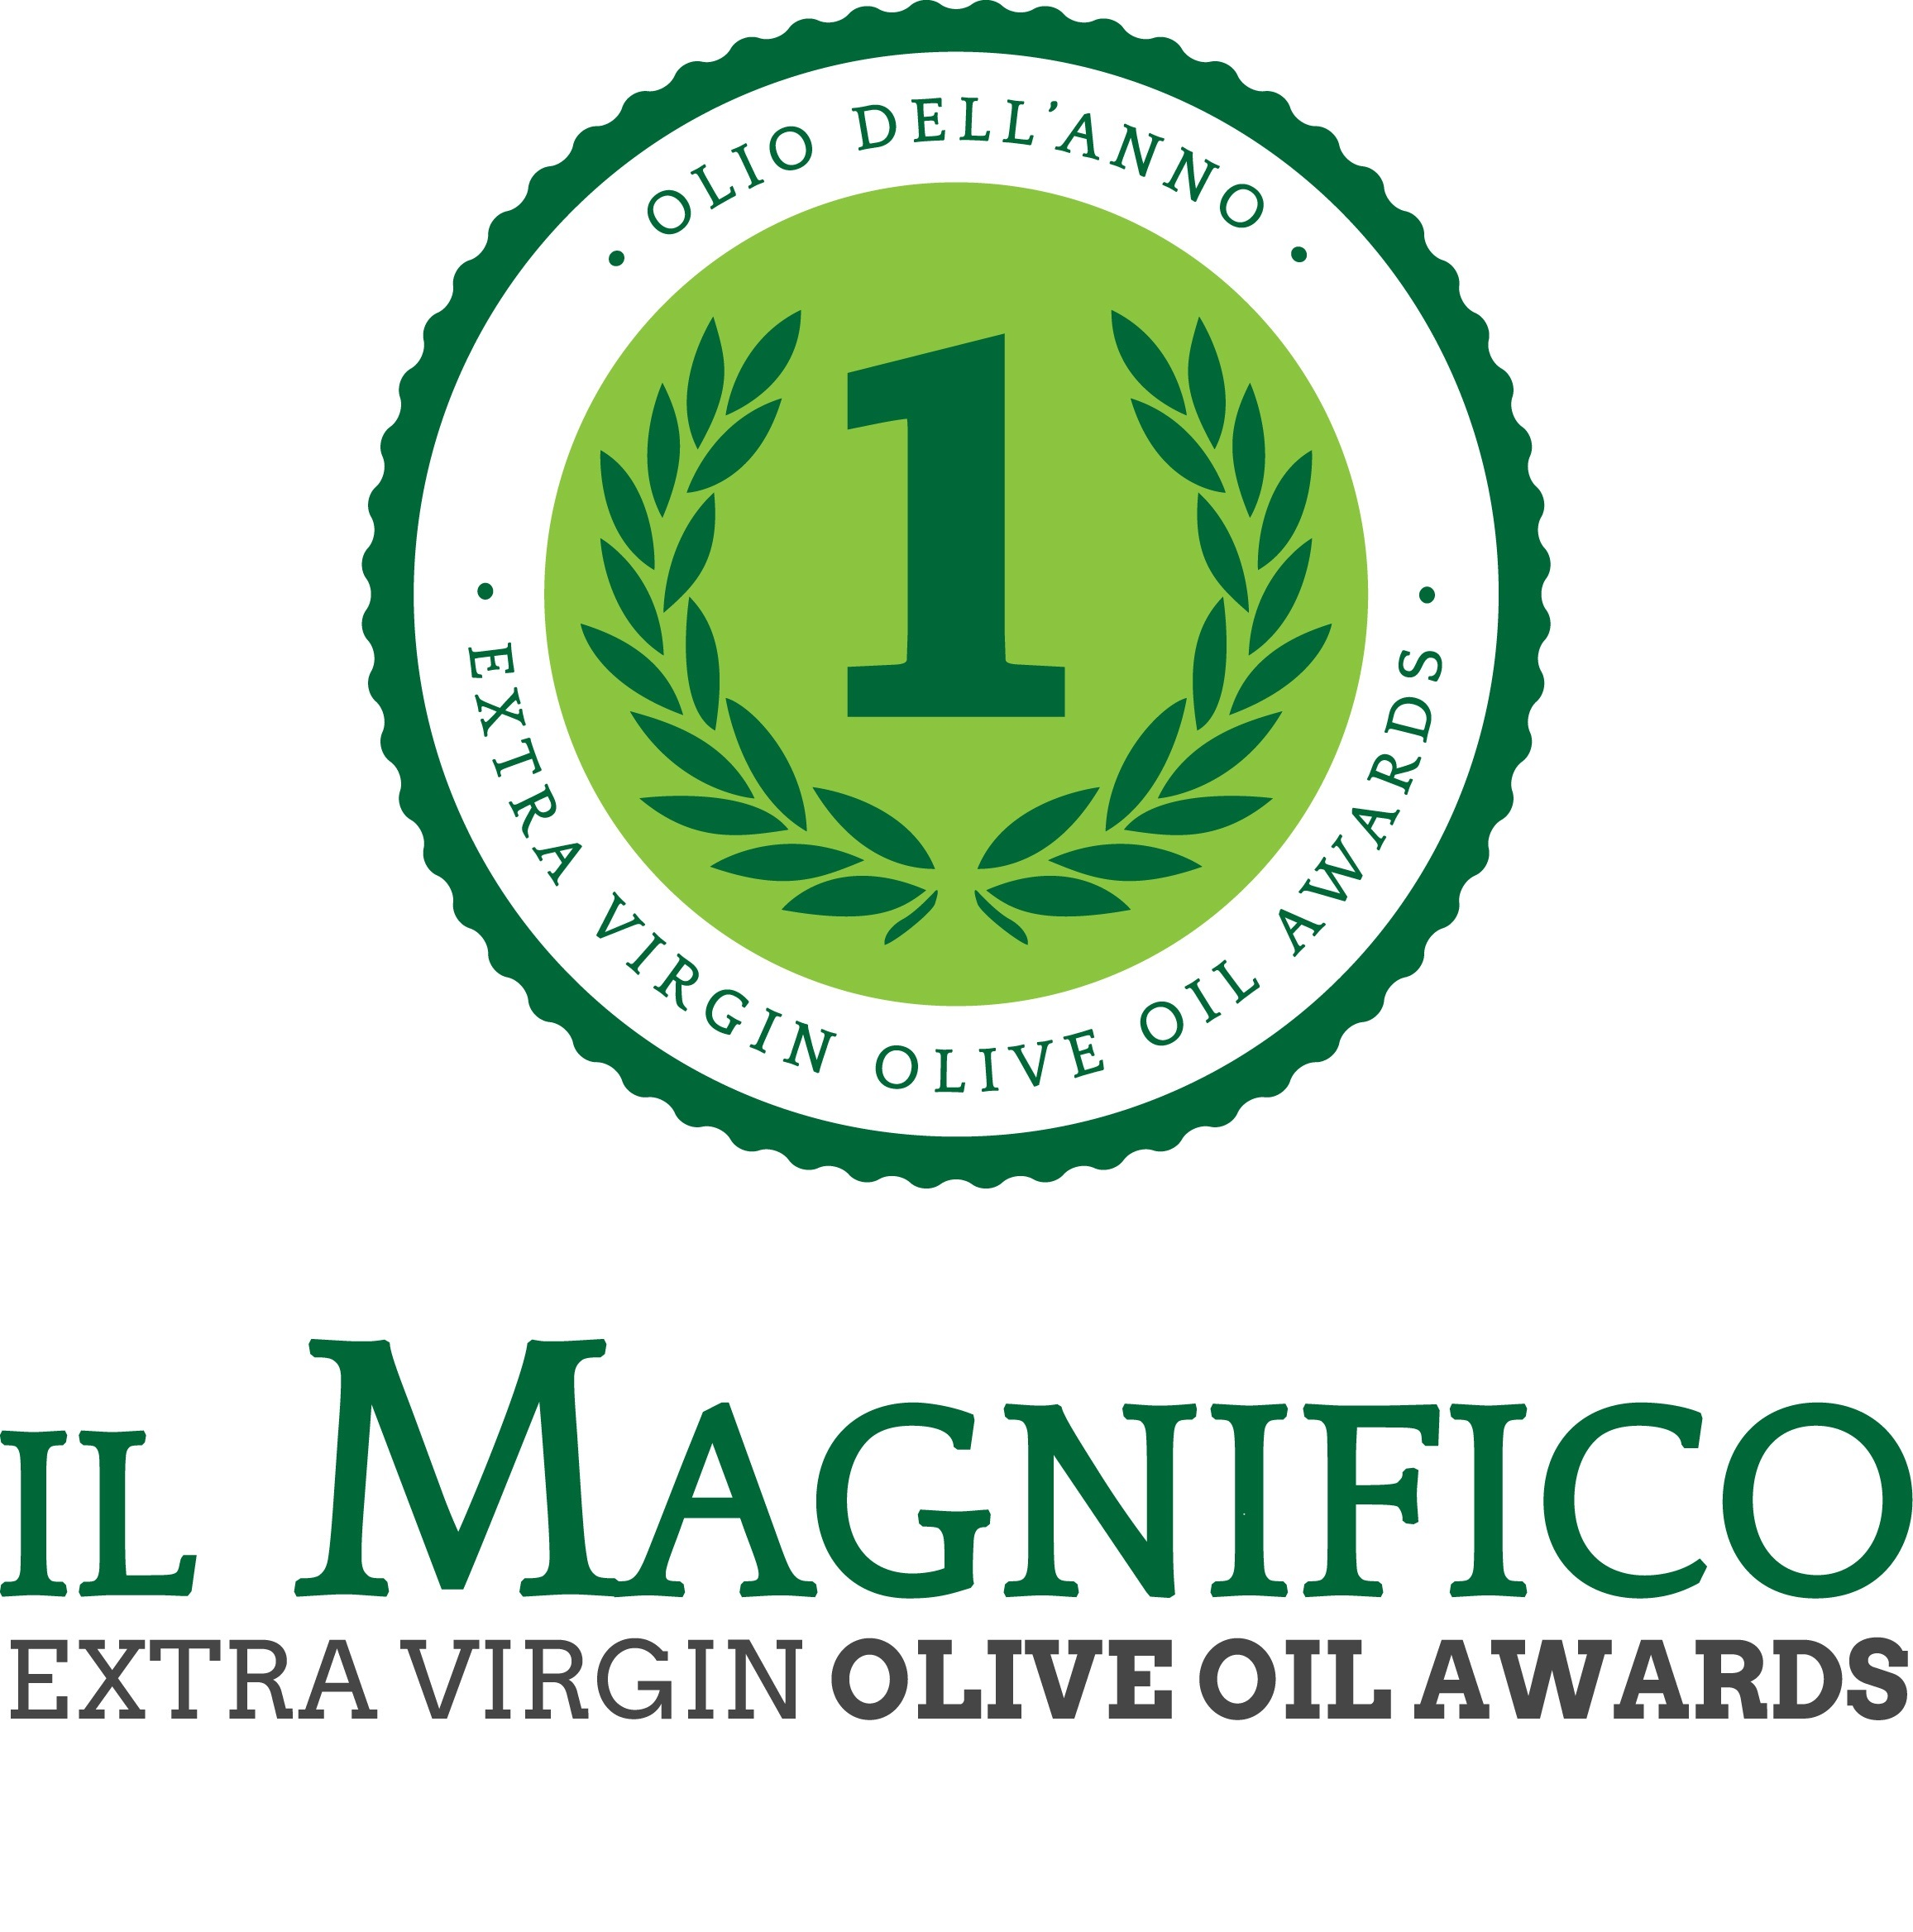 Torna Il Magnifico Extra Virgin Olive Oil Award